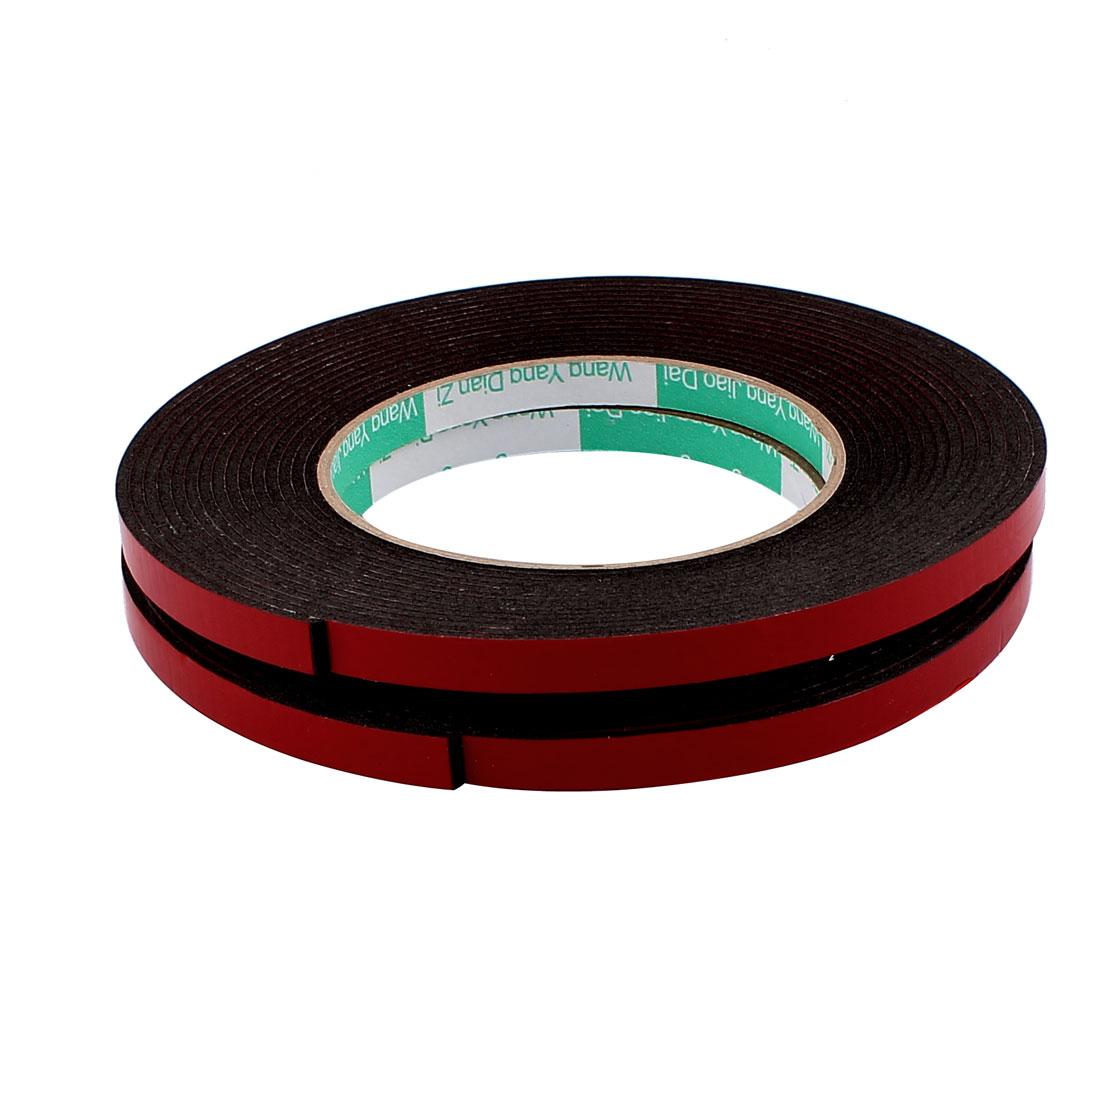 2 Pcs 8mmx2mm Double Sided Sponge Tape Adhesive Sticker Foam Glue Strip Sealing 5 Meters